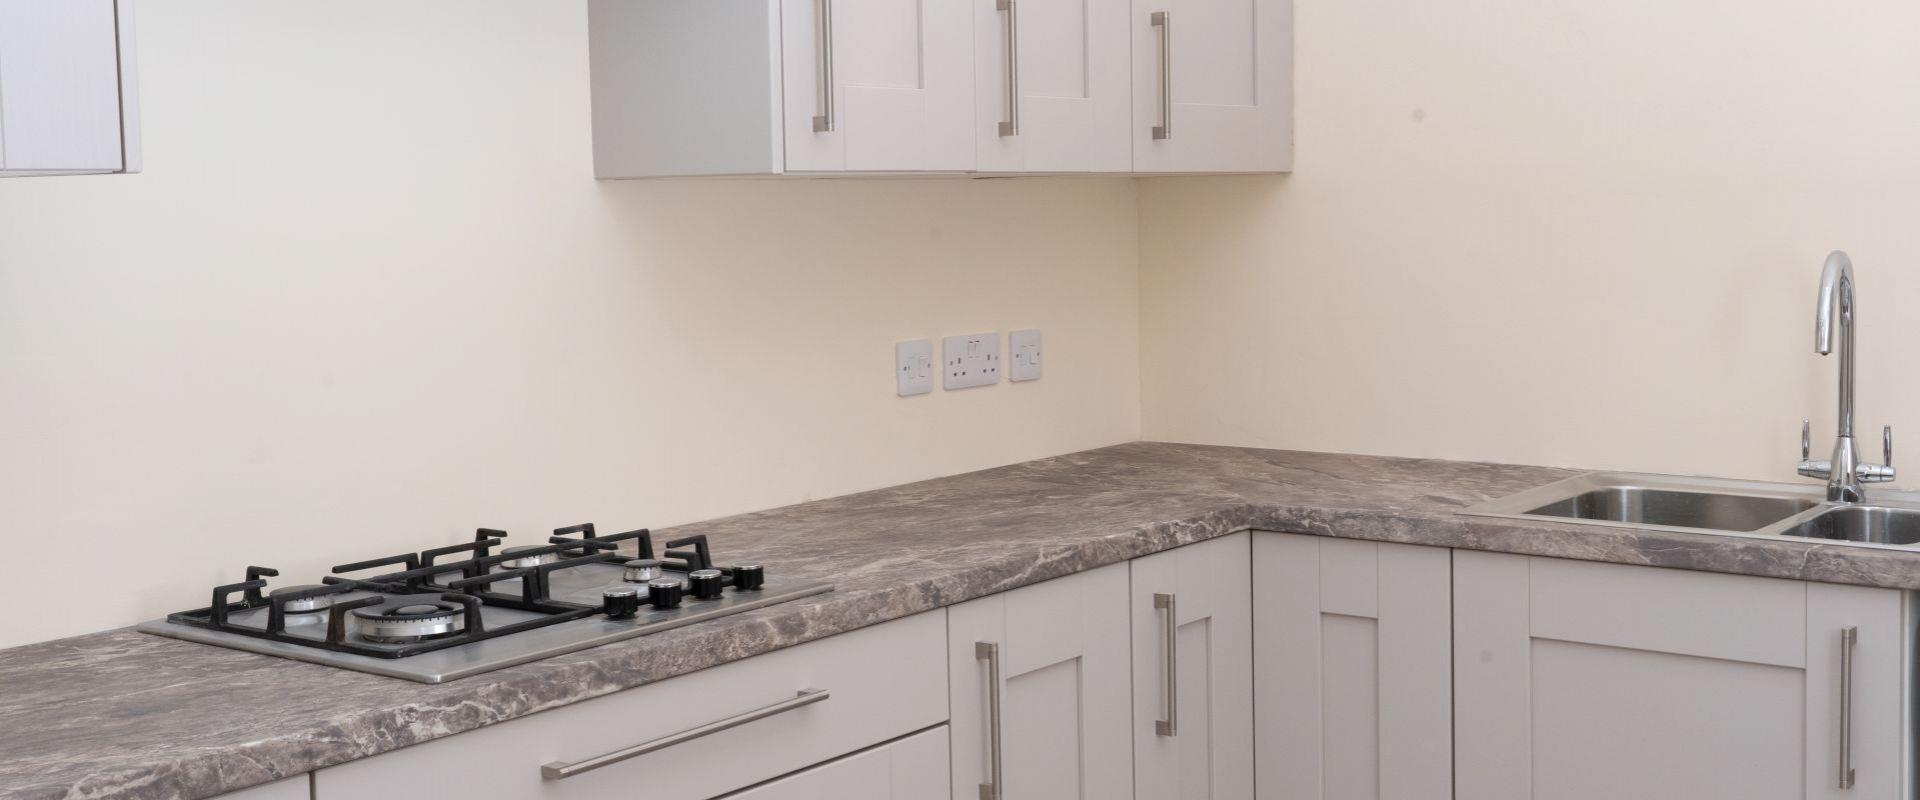 ARD-Properties-Development-Sites-Buy-Homes-Rent-Aberdeenshire-Rentals-2a-St-Andrew-Streeet-Peterhead-Banner (12)